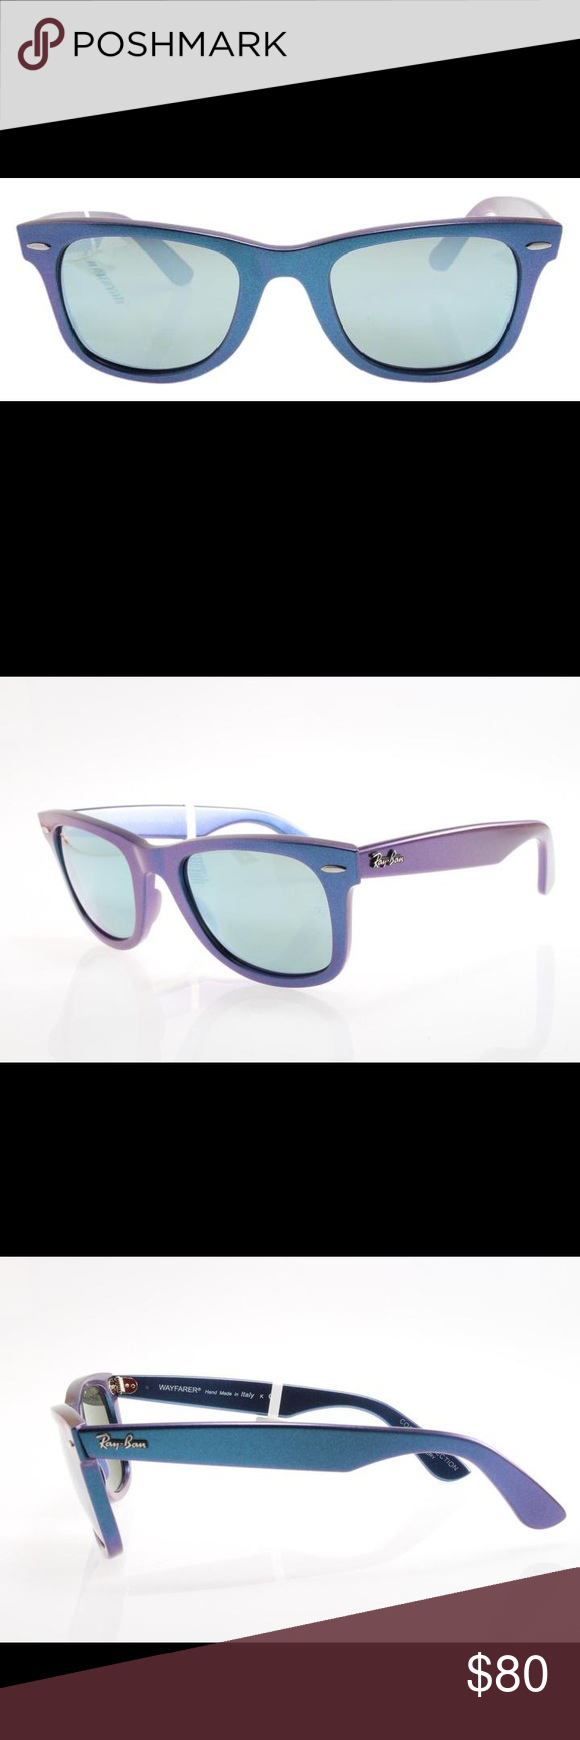 4a7873fd8be69 Ray-Ban Blue Wayfarer Cosmo Mercury Sunglasses New original sunglasses Ray  Ban RB 2140 6113